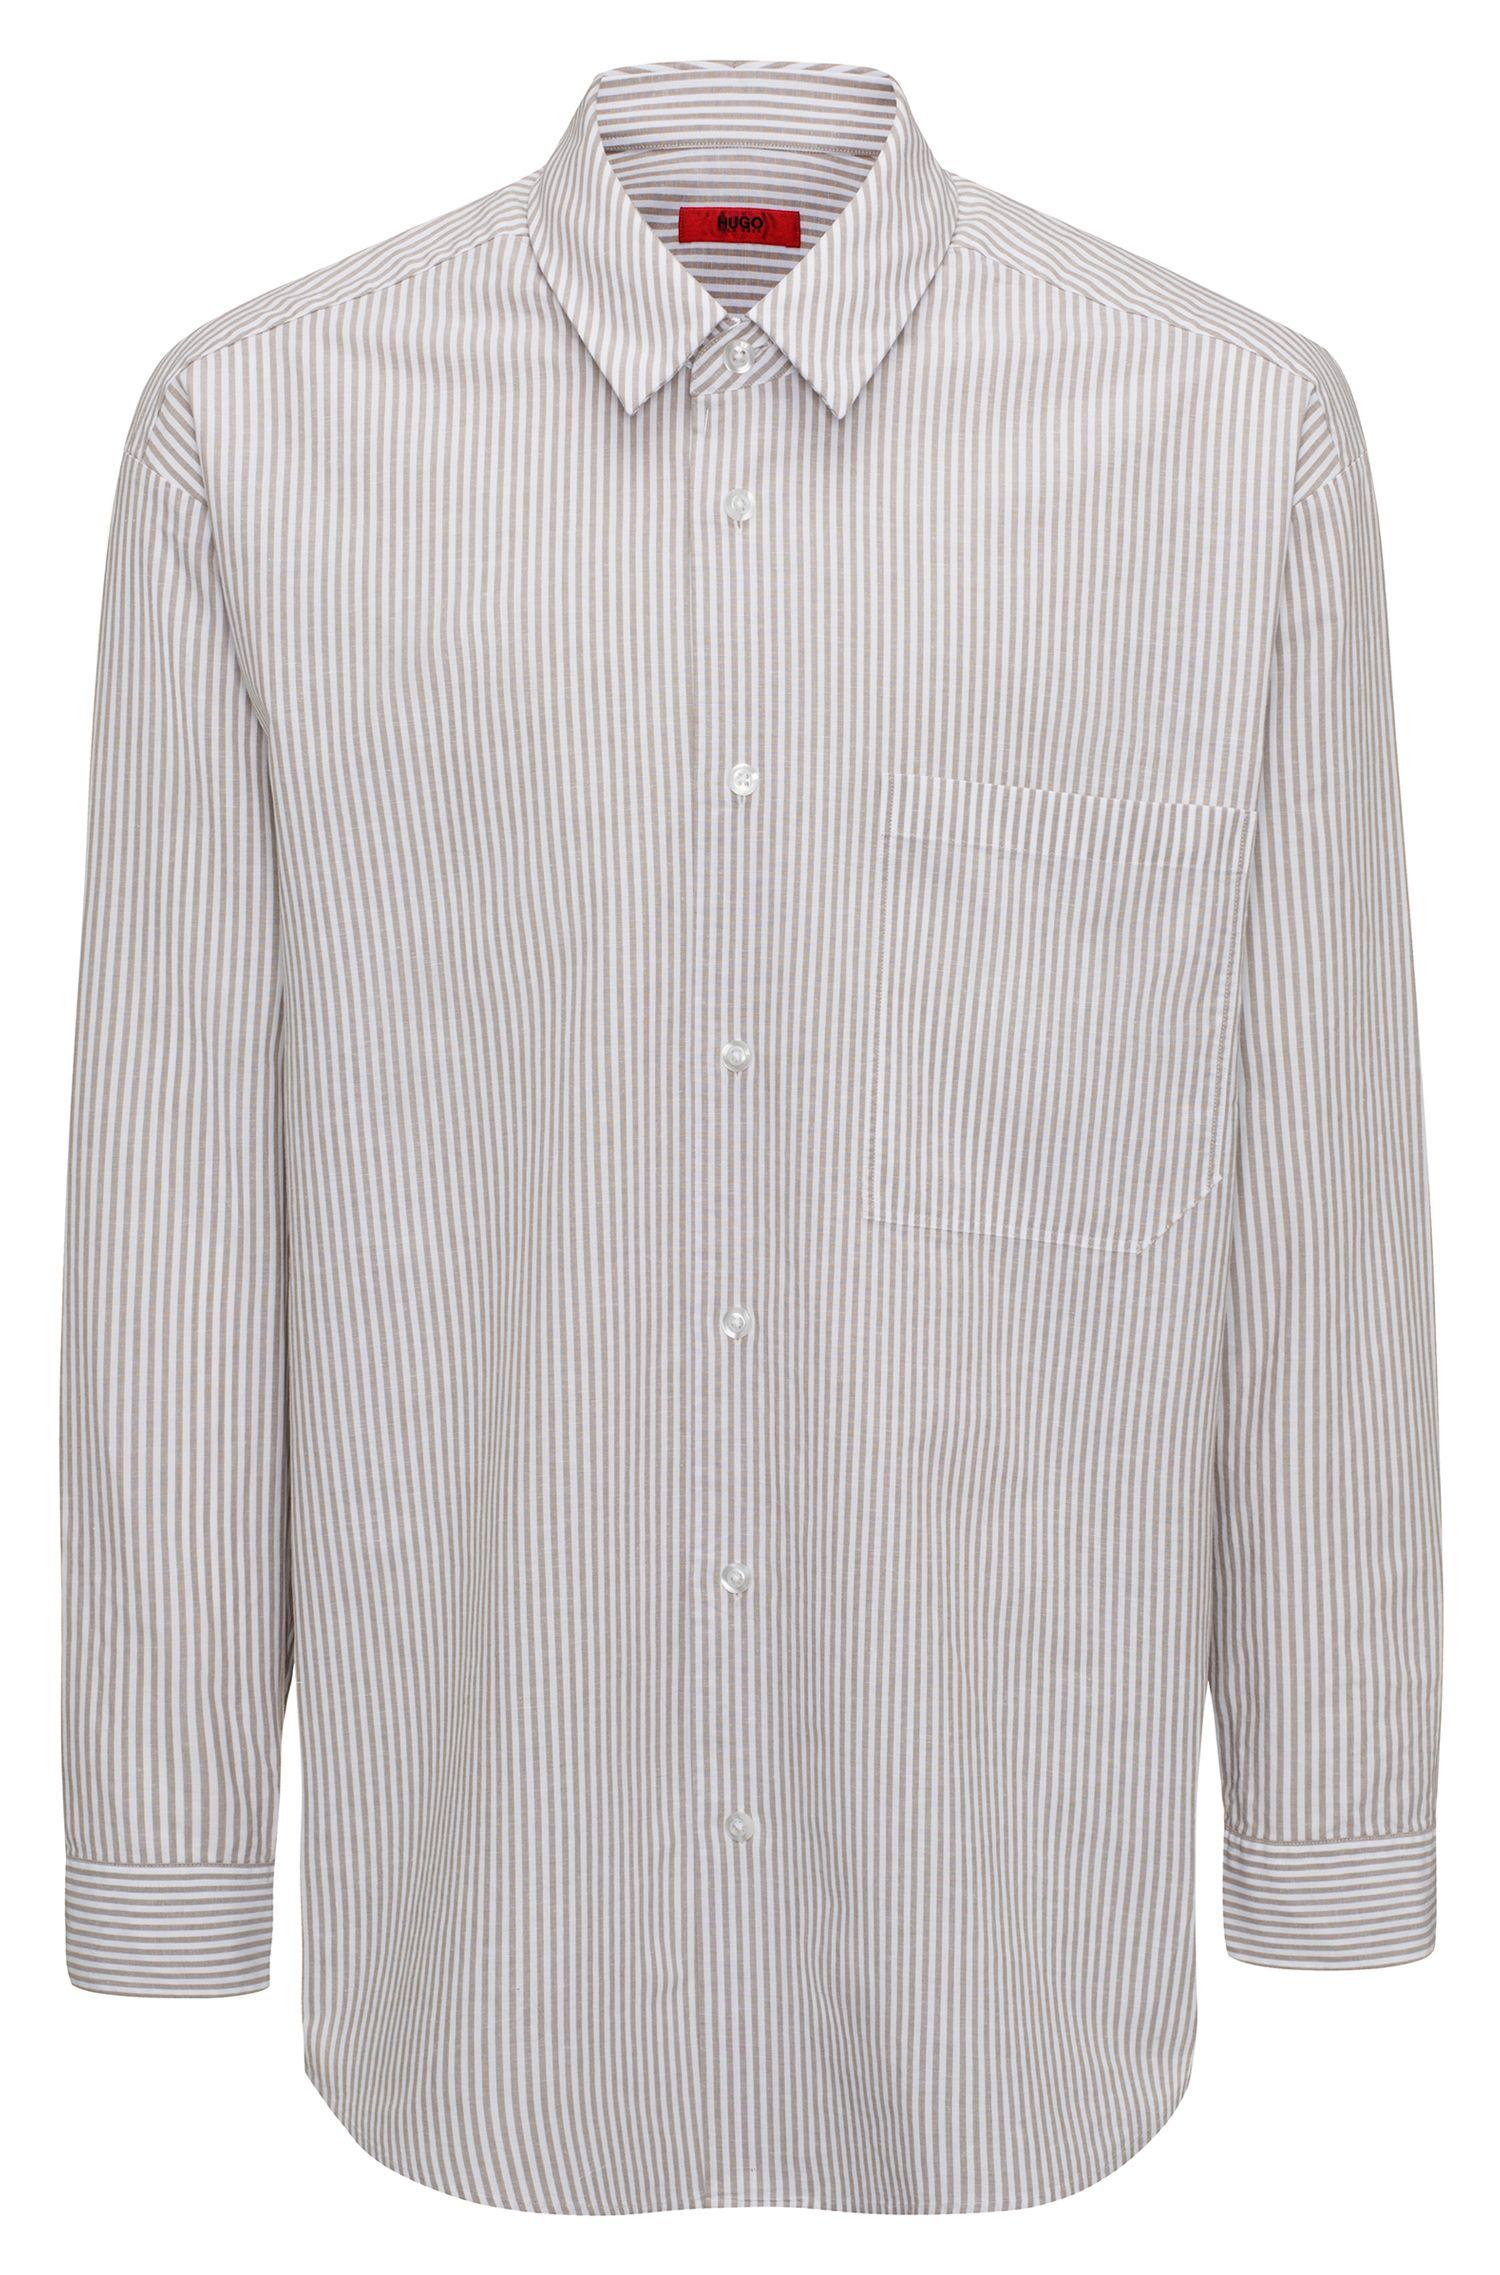 Runway Edition Linen Cotton Sport Shirt, Oversized Fit | Erilio